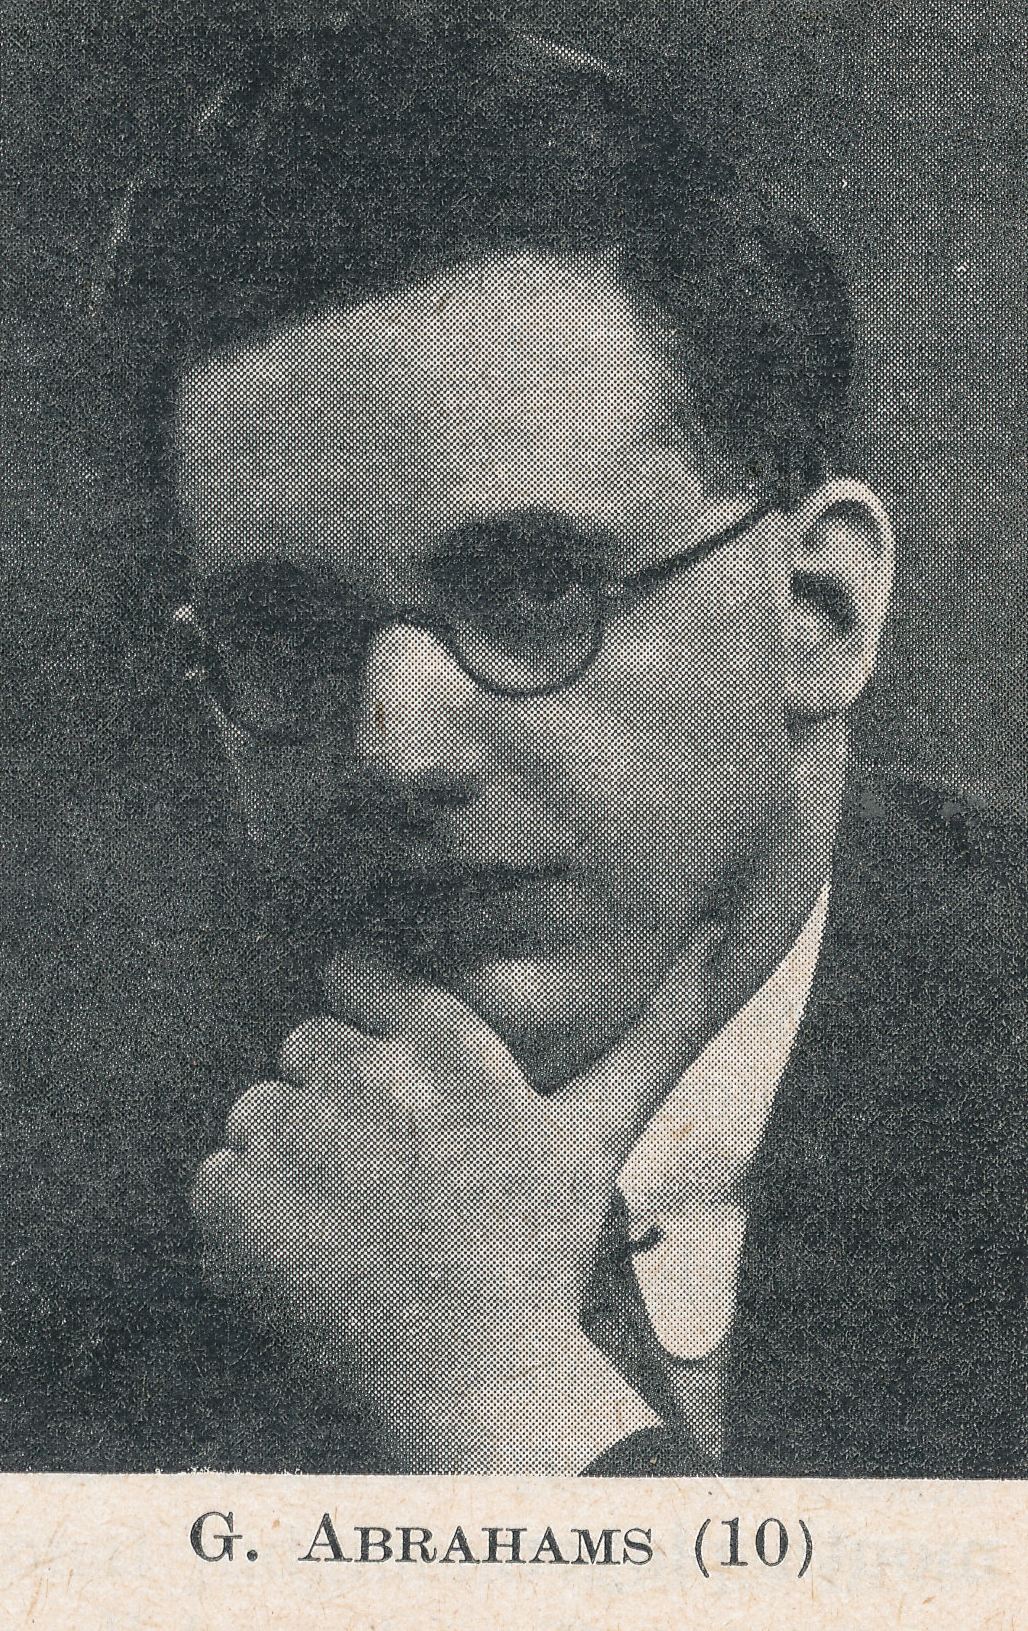 Gerald Abrahams (15-iv-1907 15-iii-1980). Source : The Anglo-Soviet Radio Chess Match